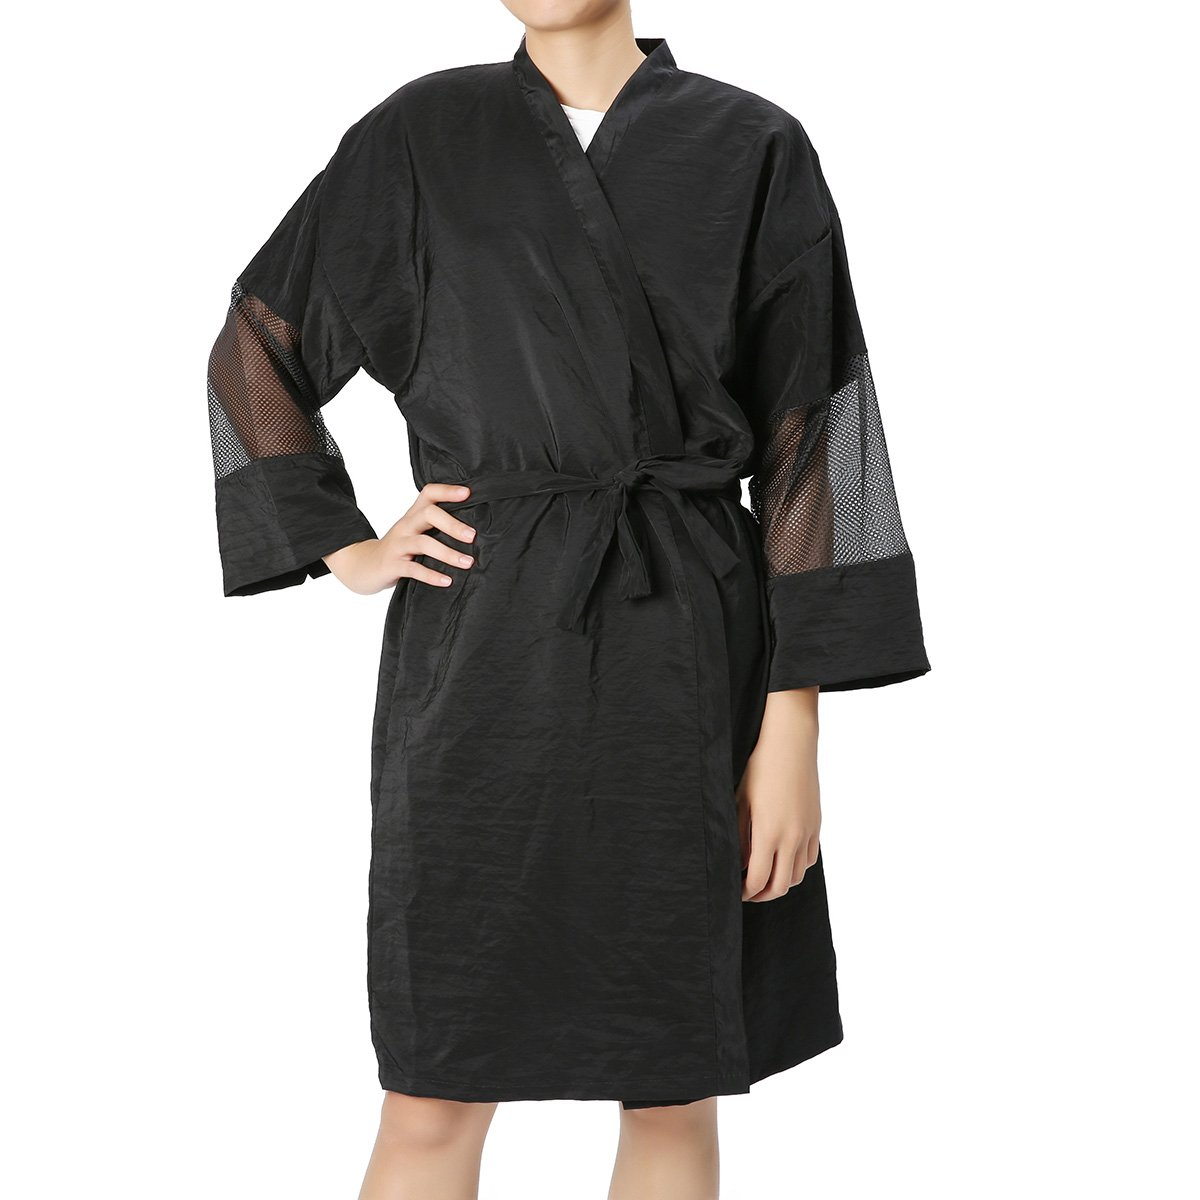 Unisex Black Salon Bathrobe, LuckyFine Waterproof Cape Kimono Robe/Gown Lightweight Water Repellent for Salon, SPA, Beauty Treatments